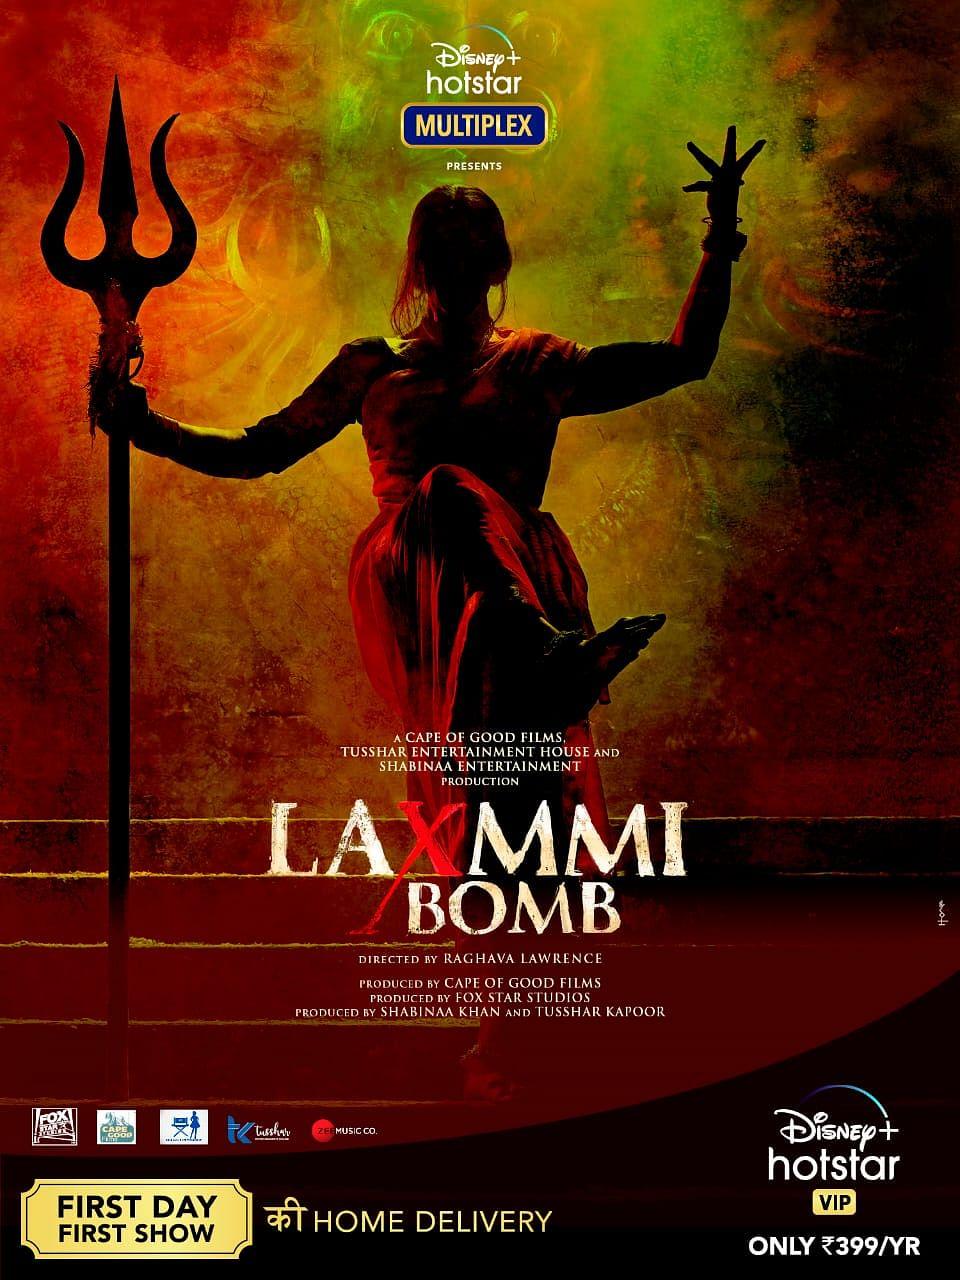 लक्ष्मी बॉम्ब फिल्म का पोस्टर